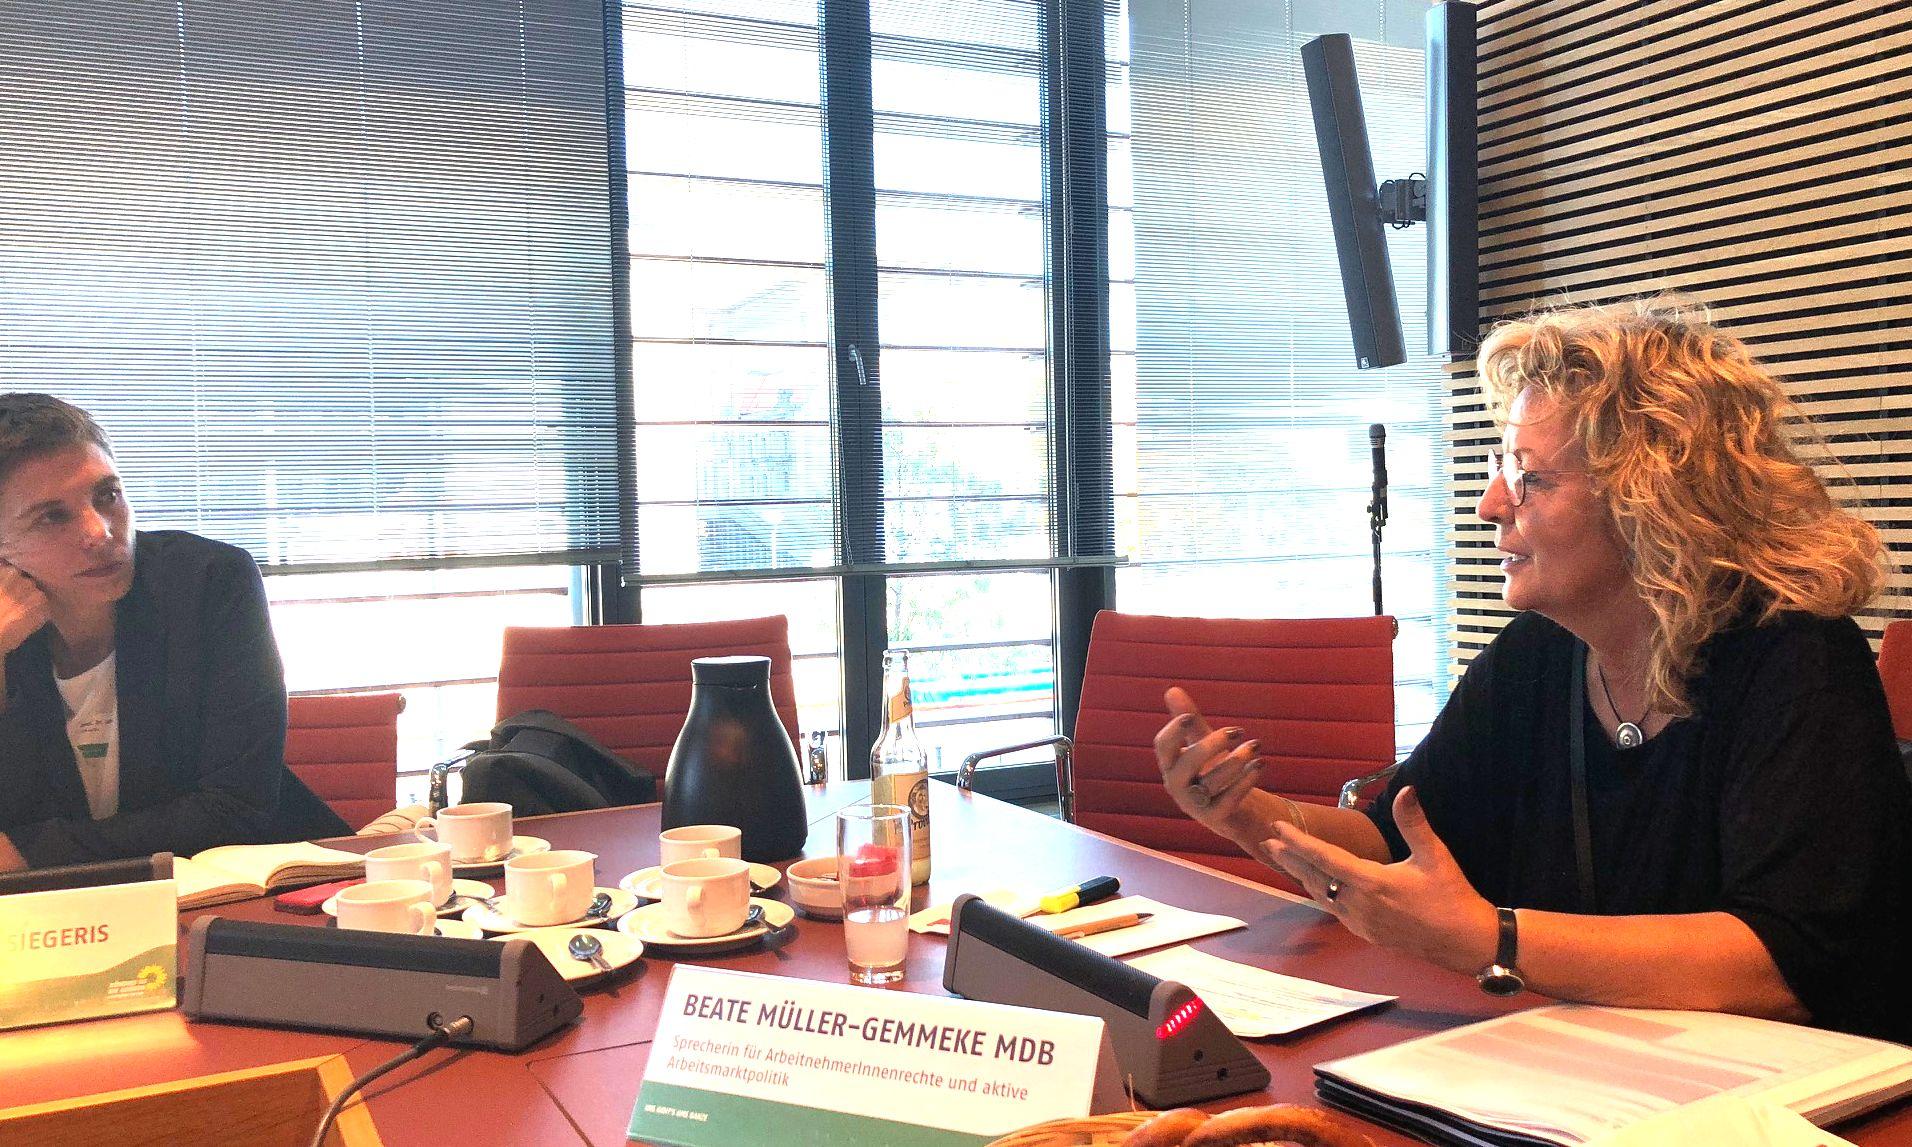 18-10-12_2_Fg_Frauen_Digitalbranche